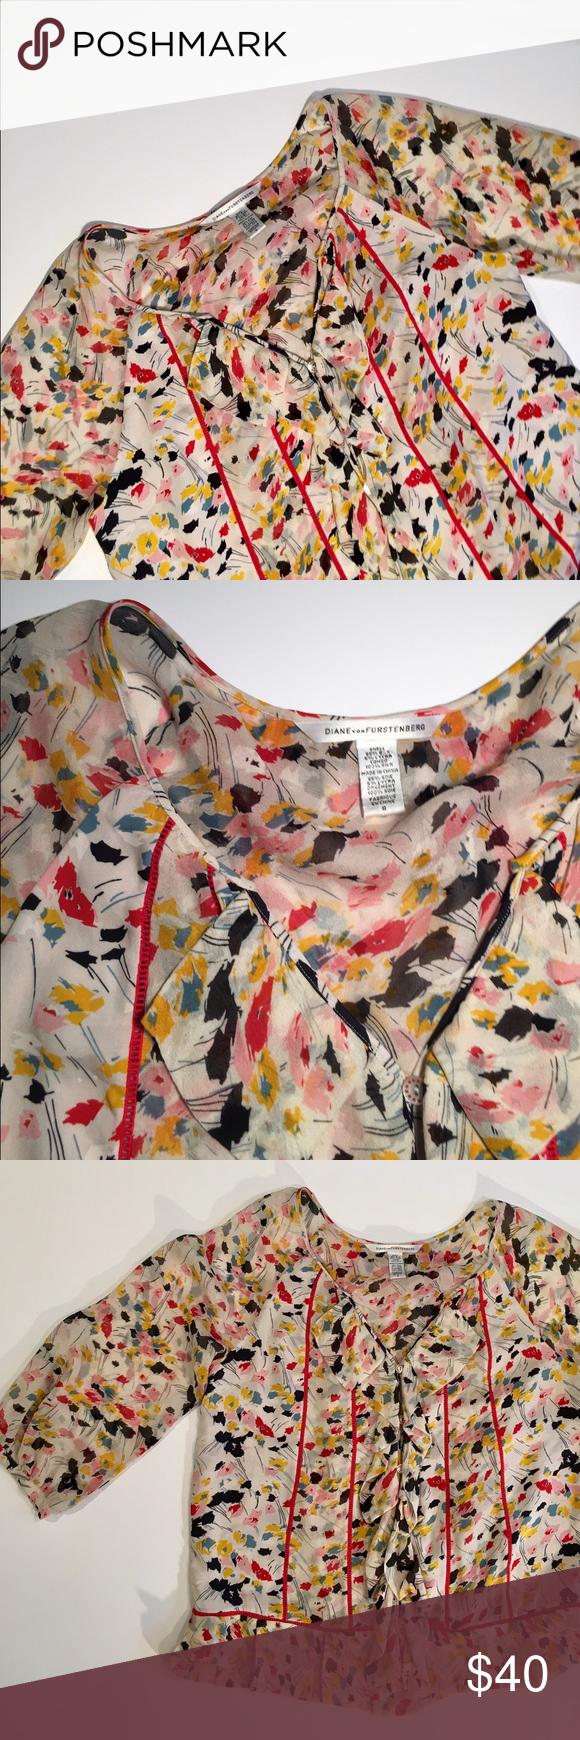 Diane von Furstenberg Silk Ruffle Front Top ✔️Excellent Condition ✔️Silk ✔️Ruffle Front/Button Down ✔️3/4 Puff Sleeve Diane von Furstenberg Tops Blouses